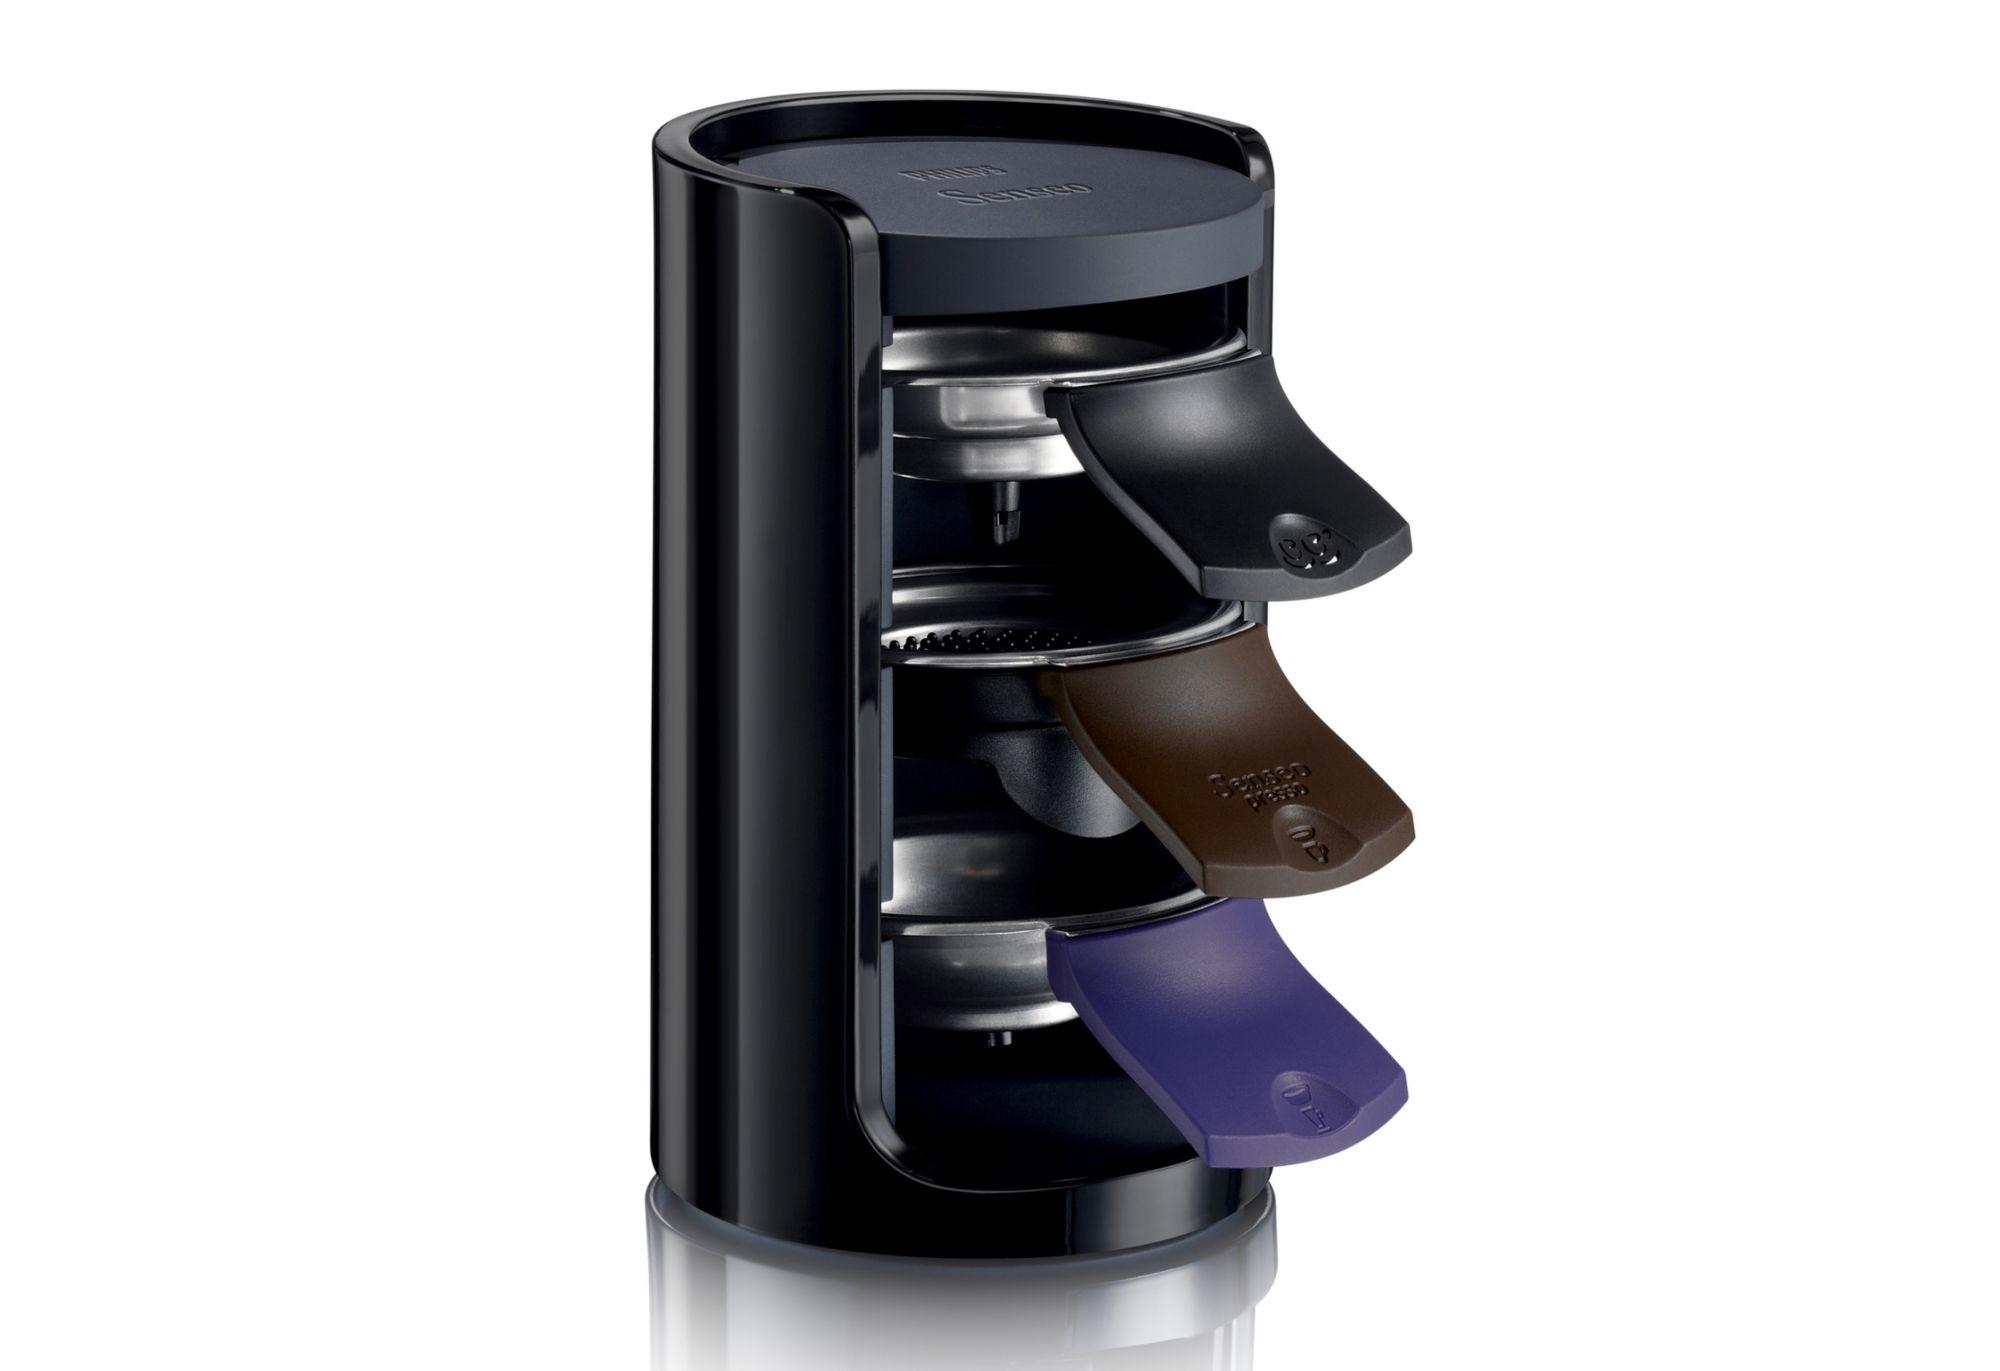 senseo kaffeepadmaschine hd7863 quadrante inkl gratis. Black Bedroom Furniture Sets. Home Design Ideas